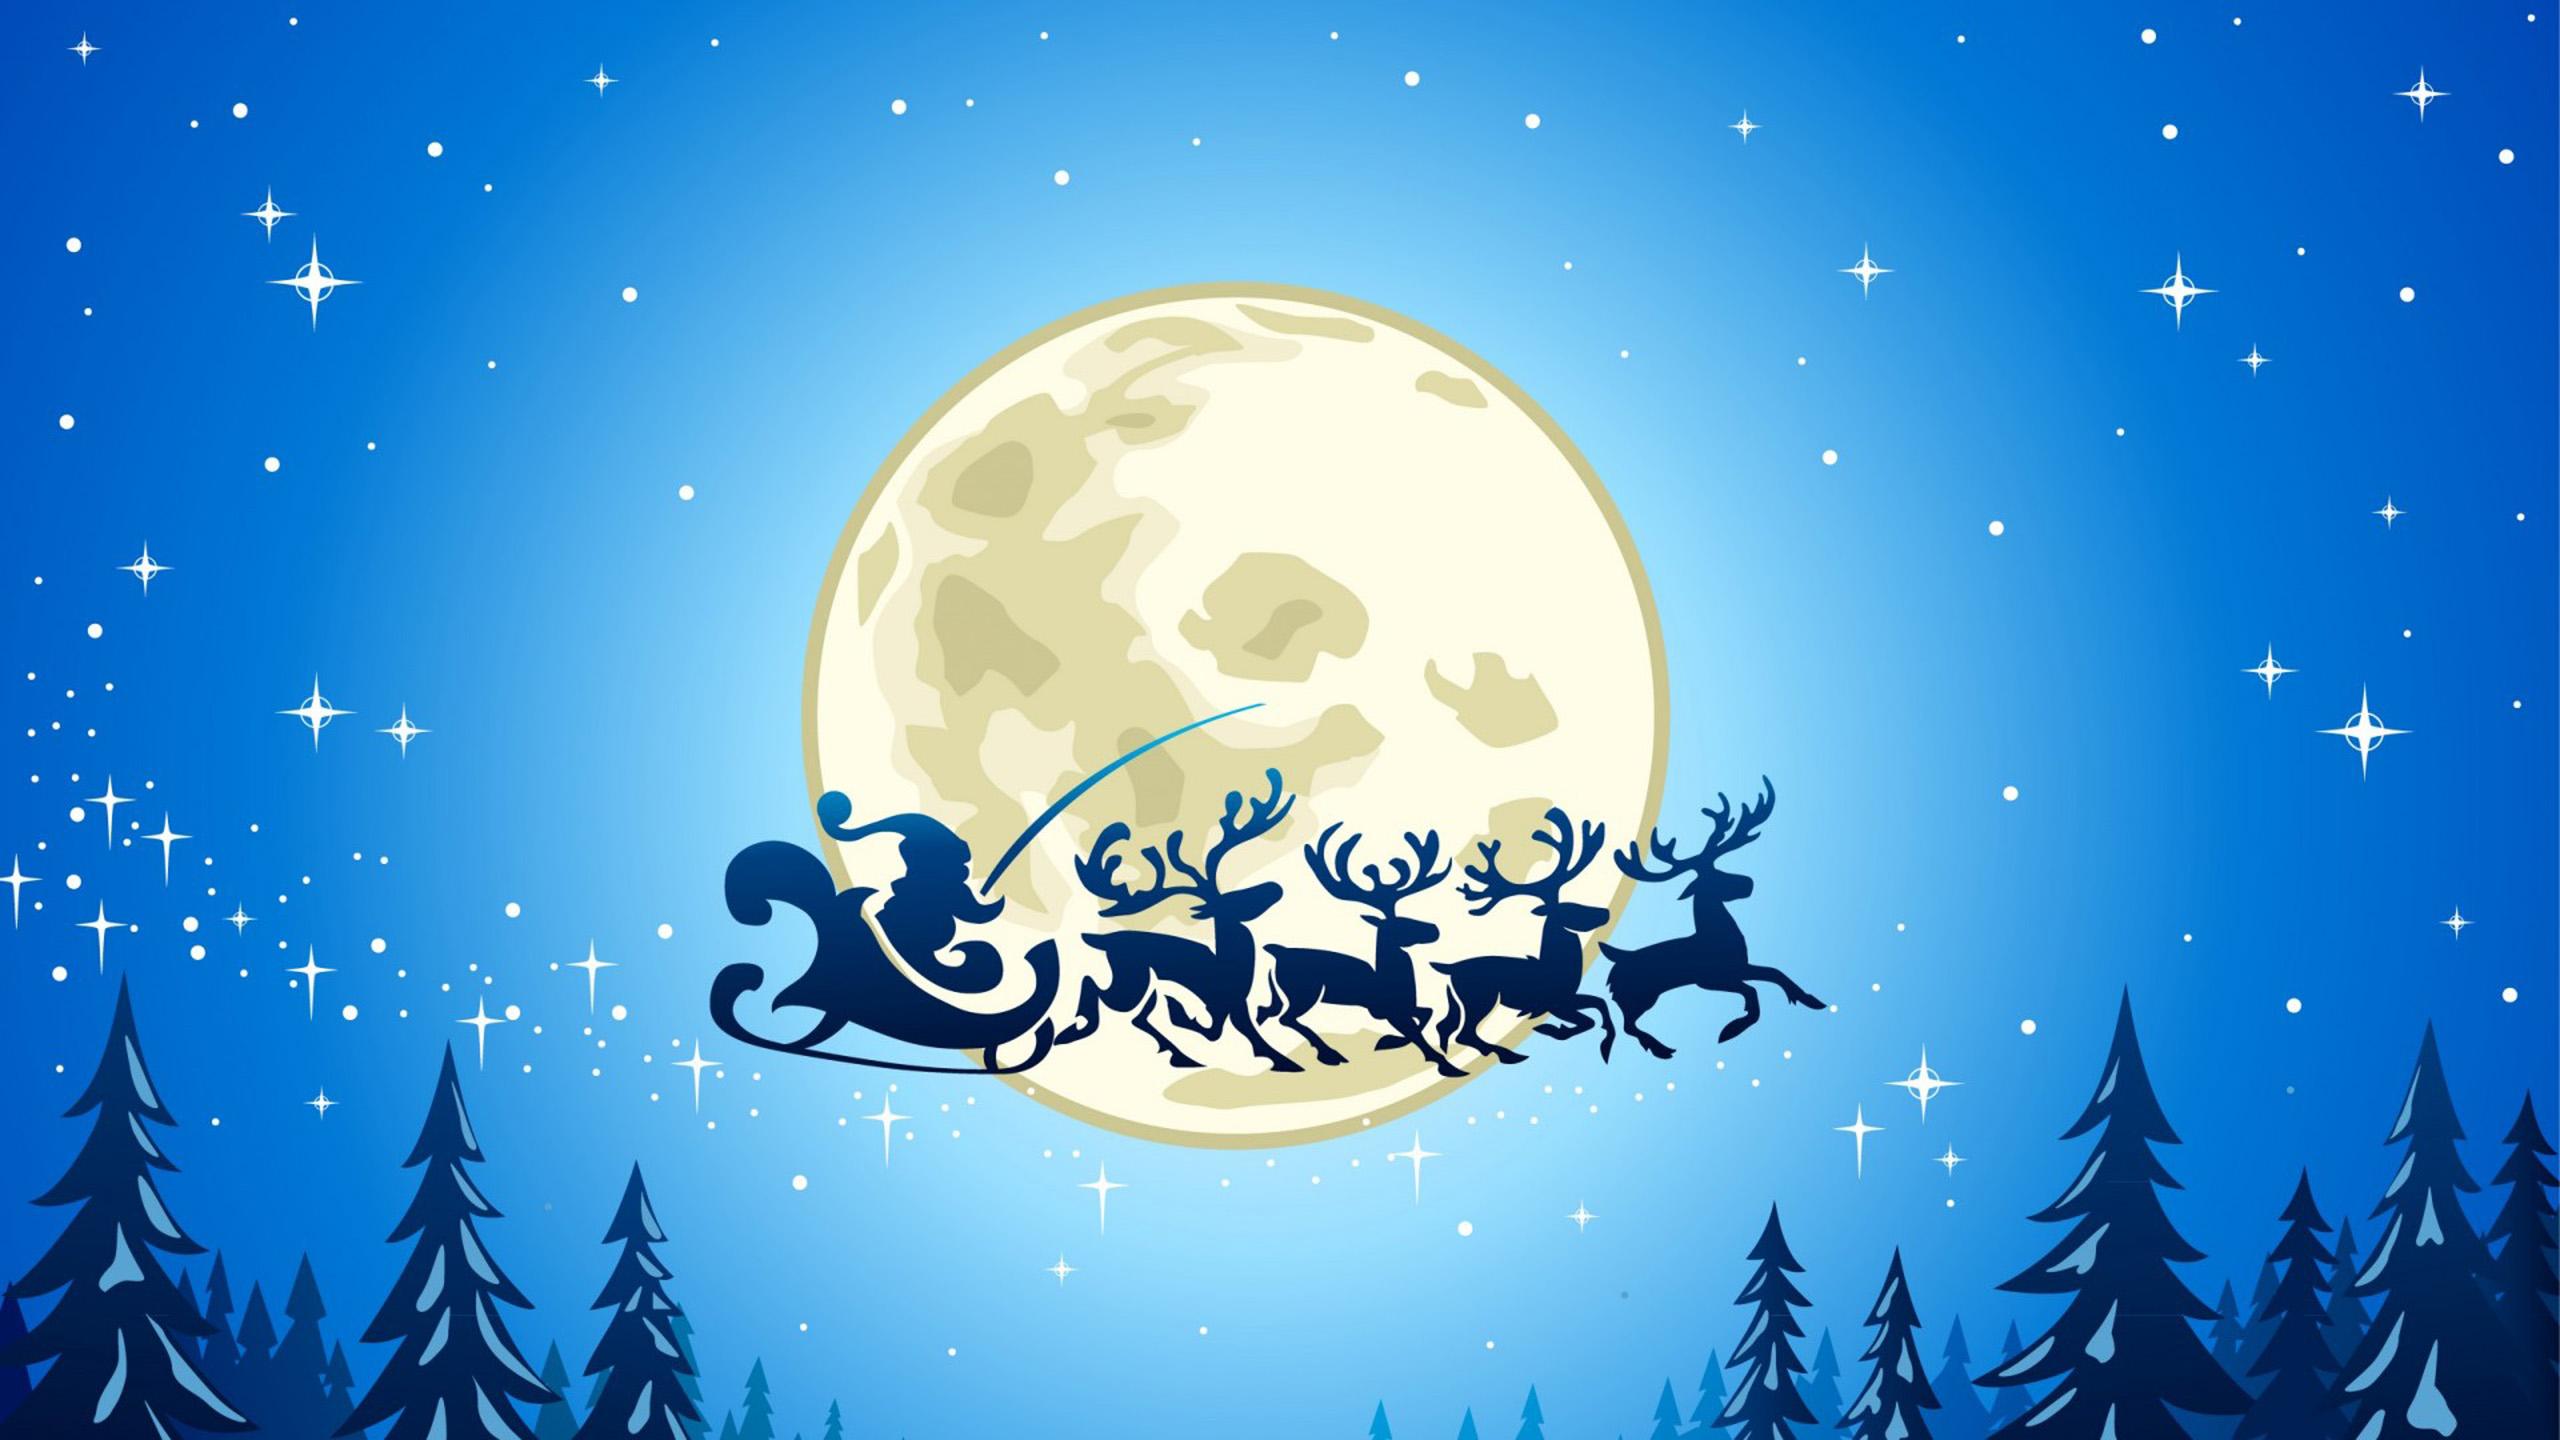 wallpaper christmas themed